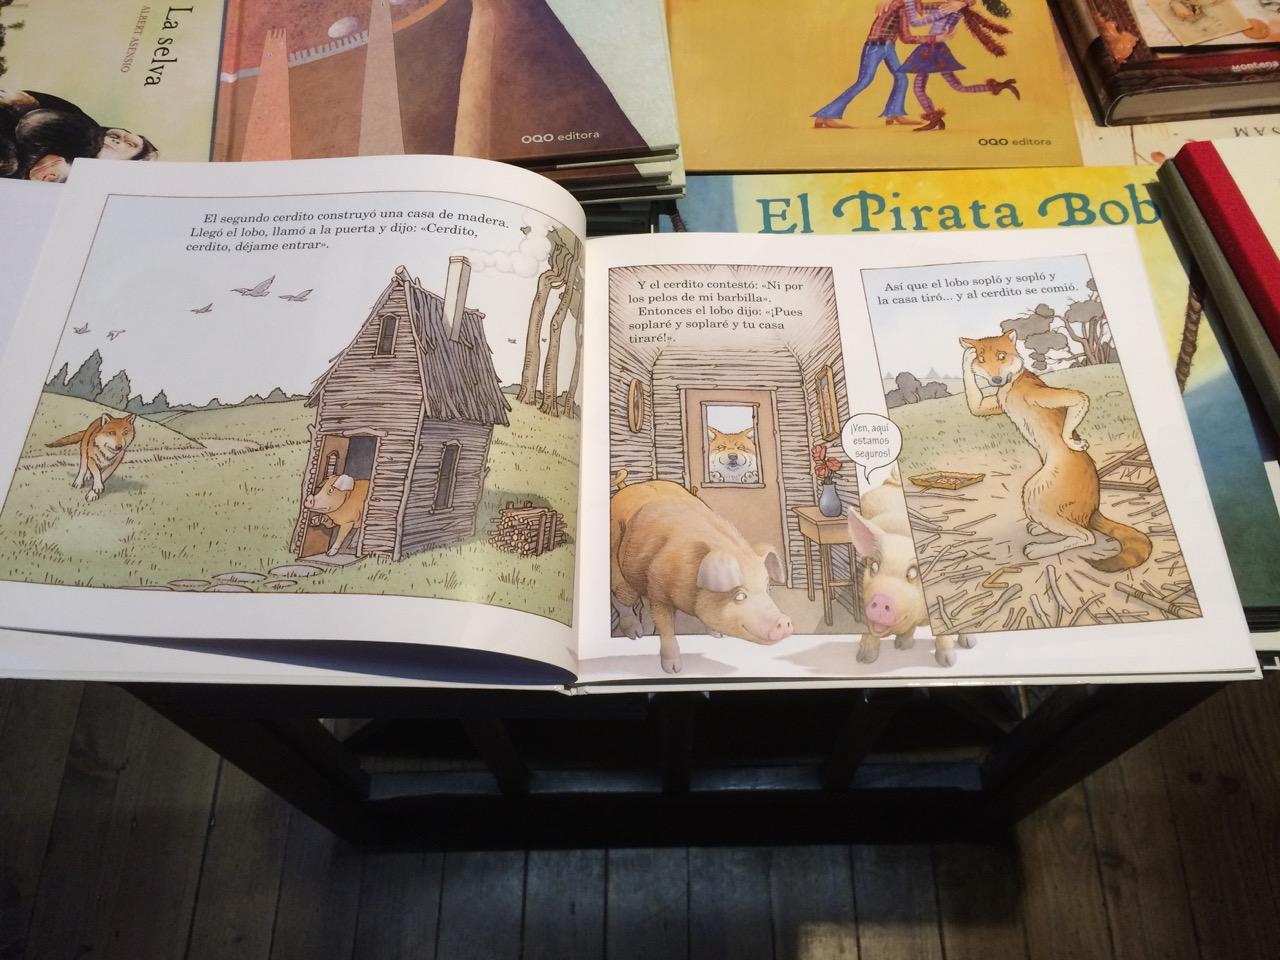 Livraria Ello